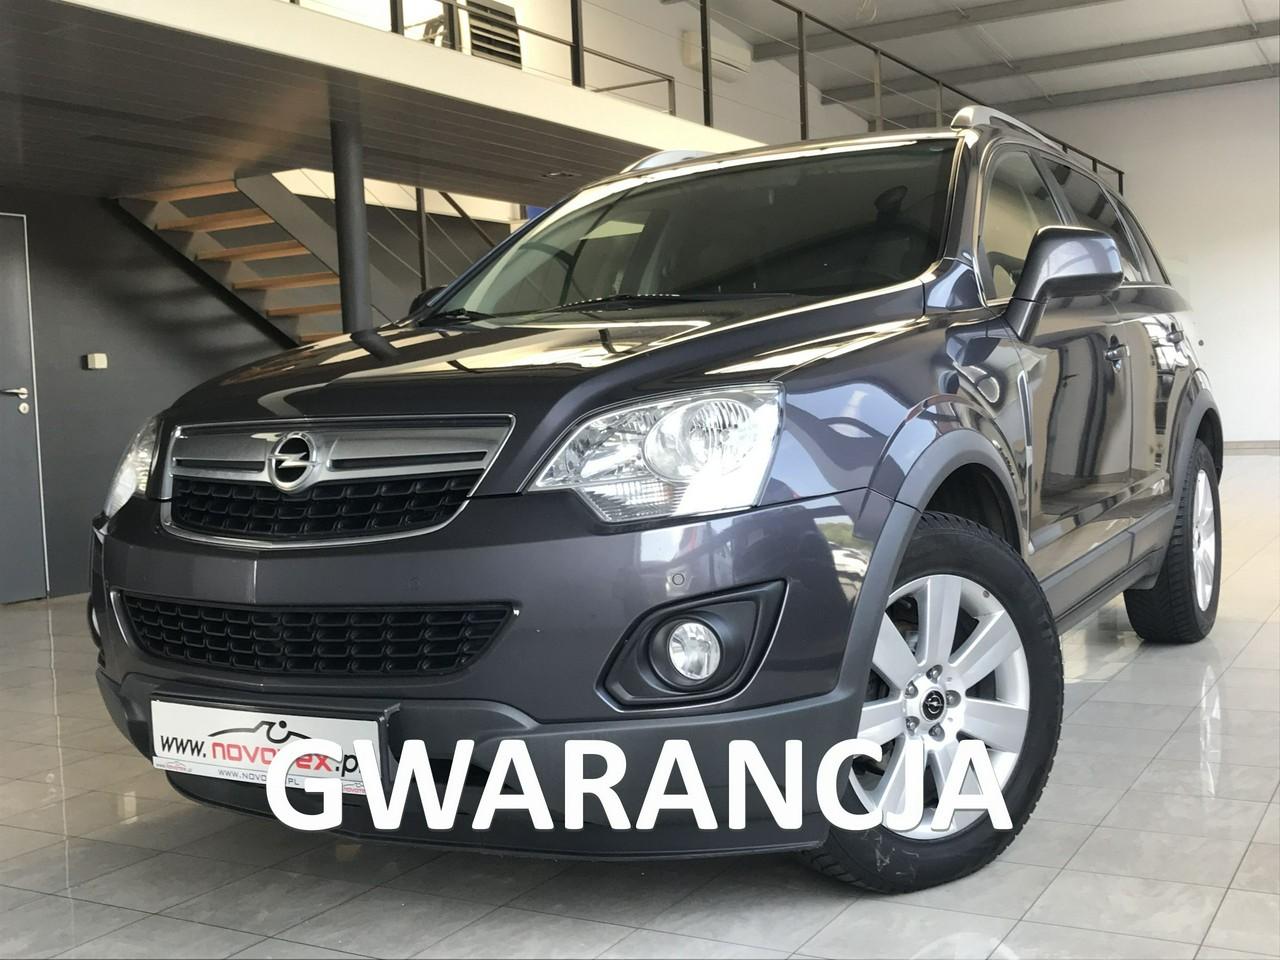 Opel Antara 2.2CDTI*Enjoy Plus*navi*skóra*ALU*bezwypadek*serwis ASO Opel*gwarancja